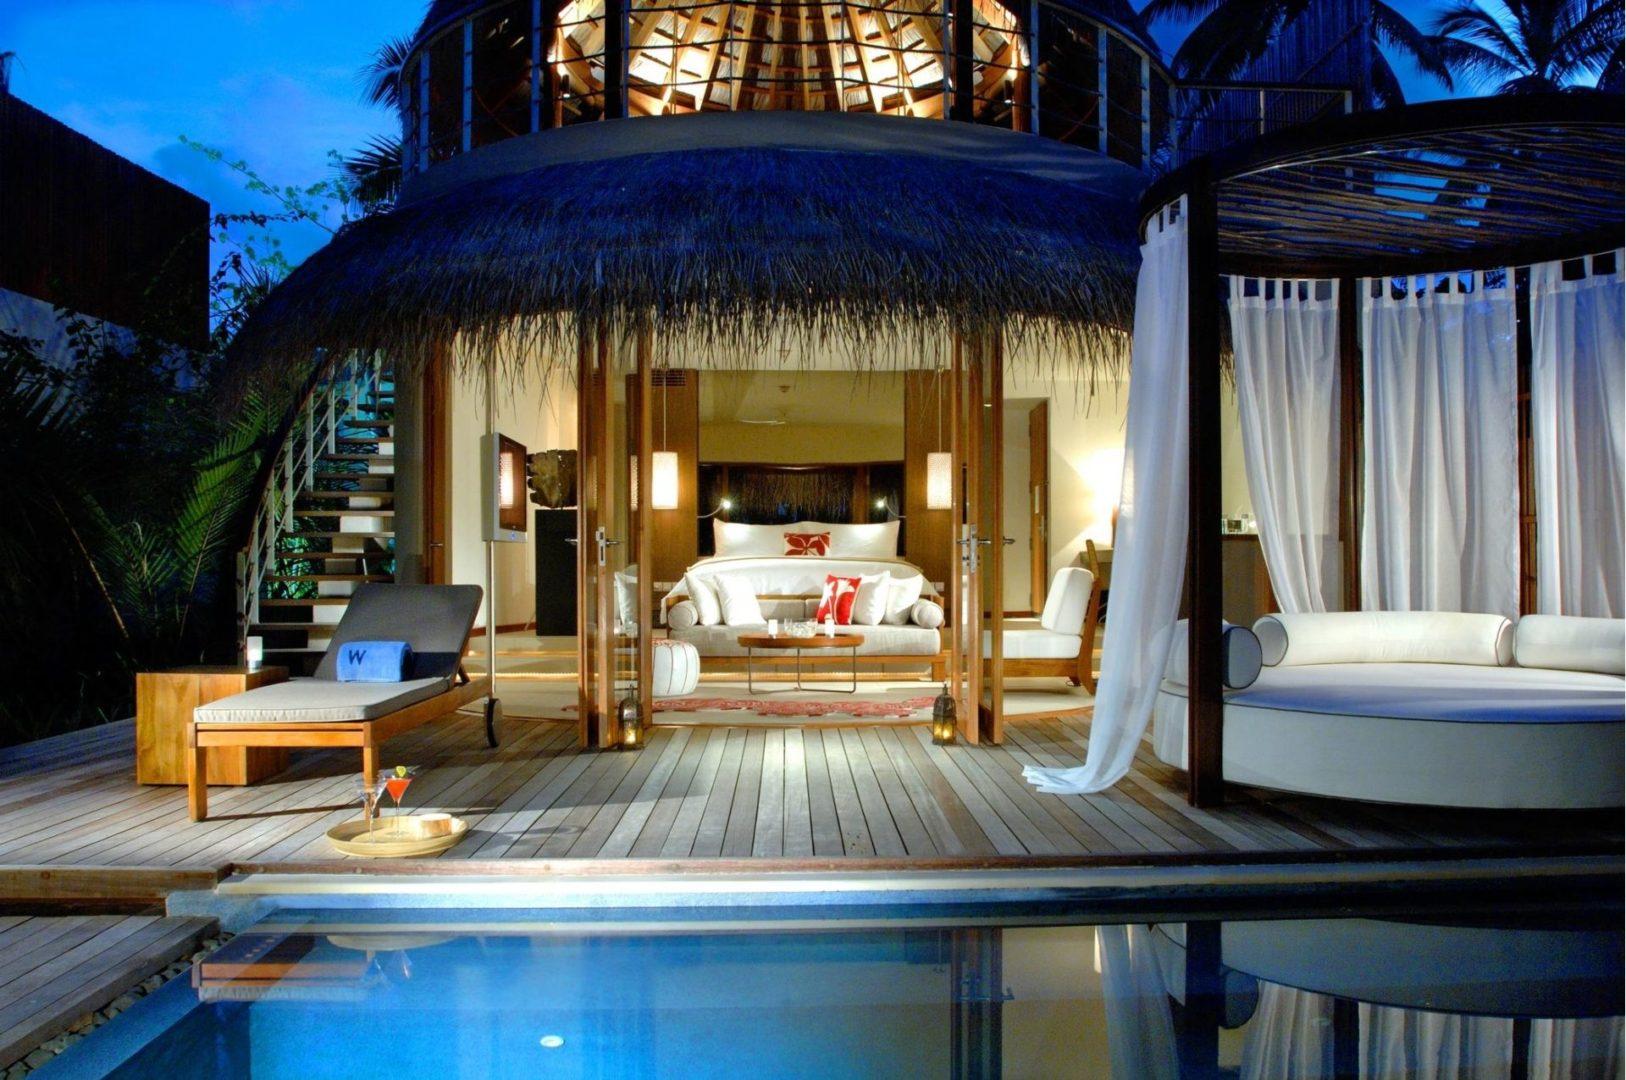 Beach Oasis Room